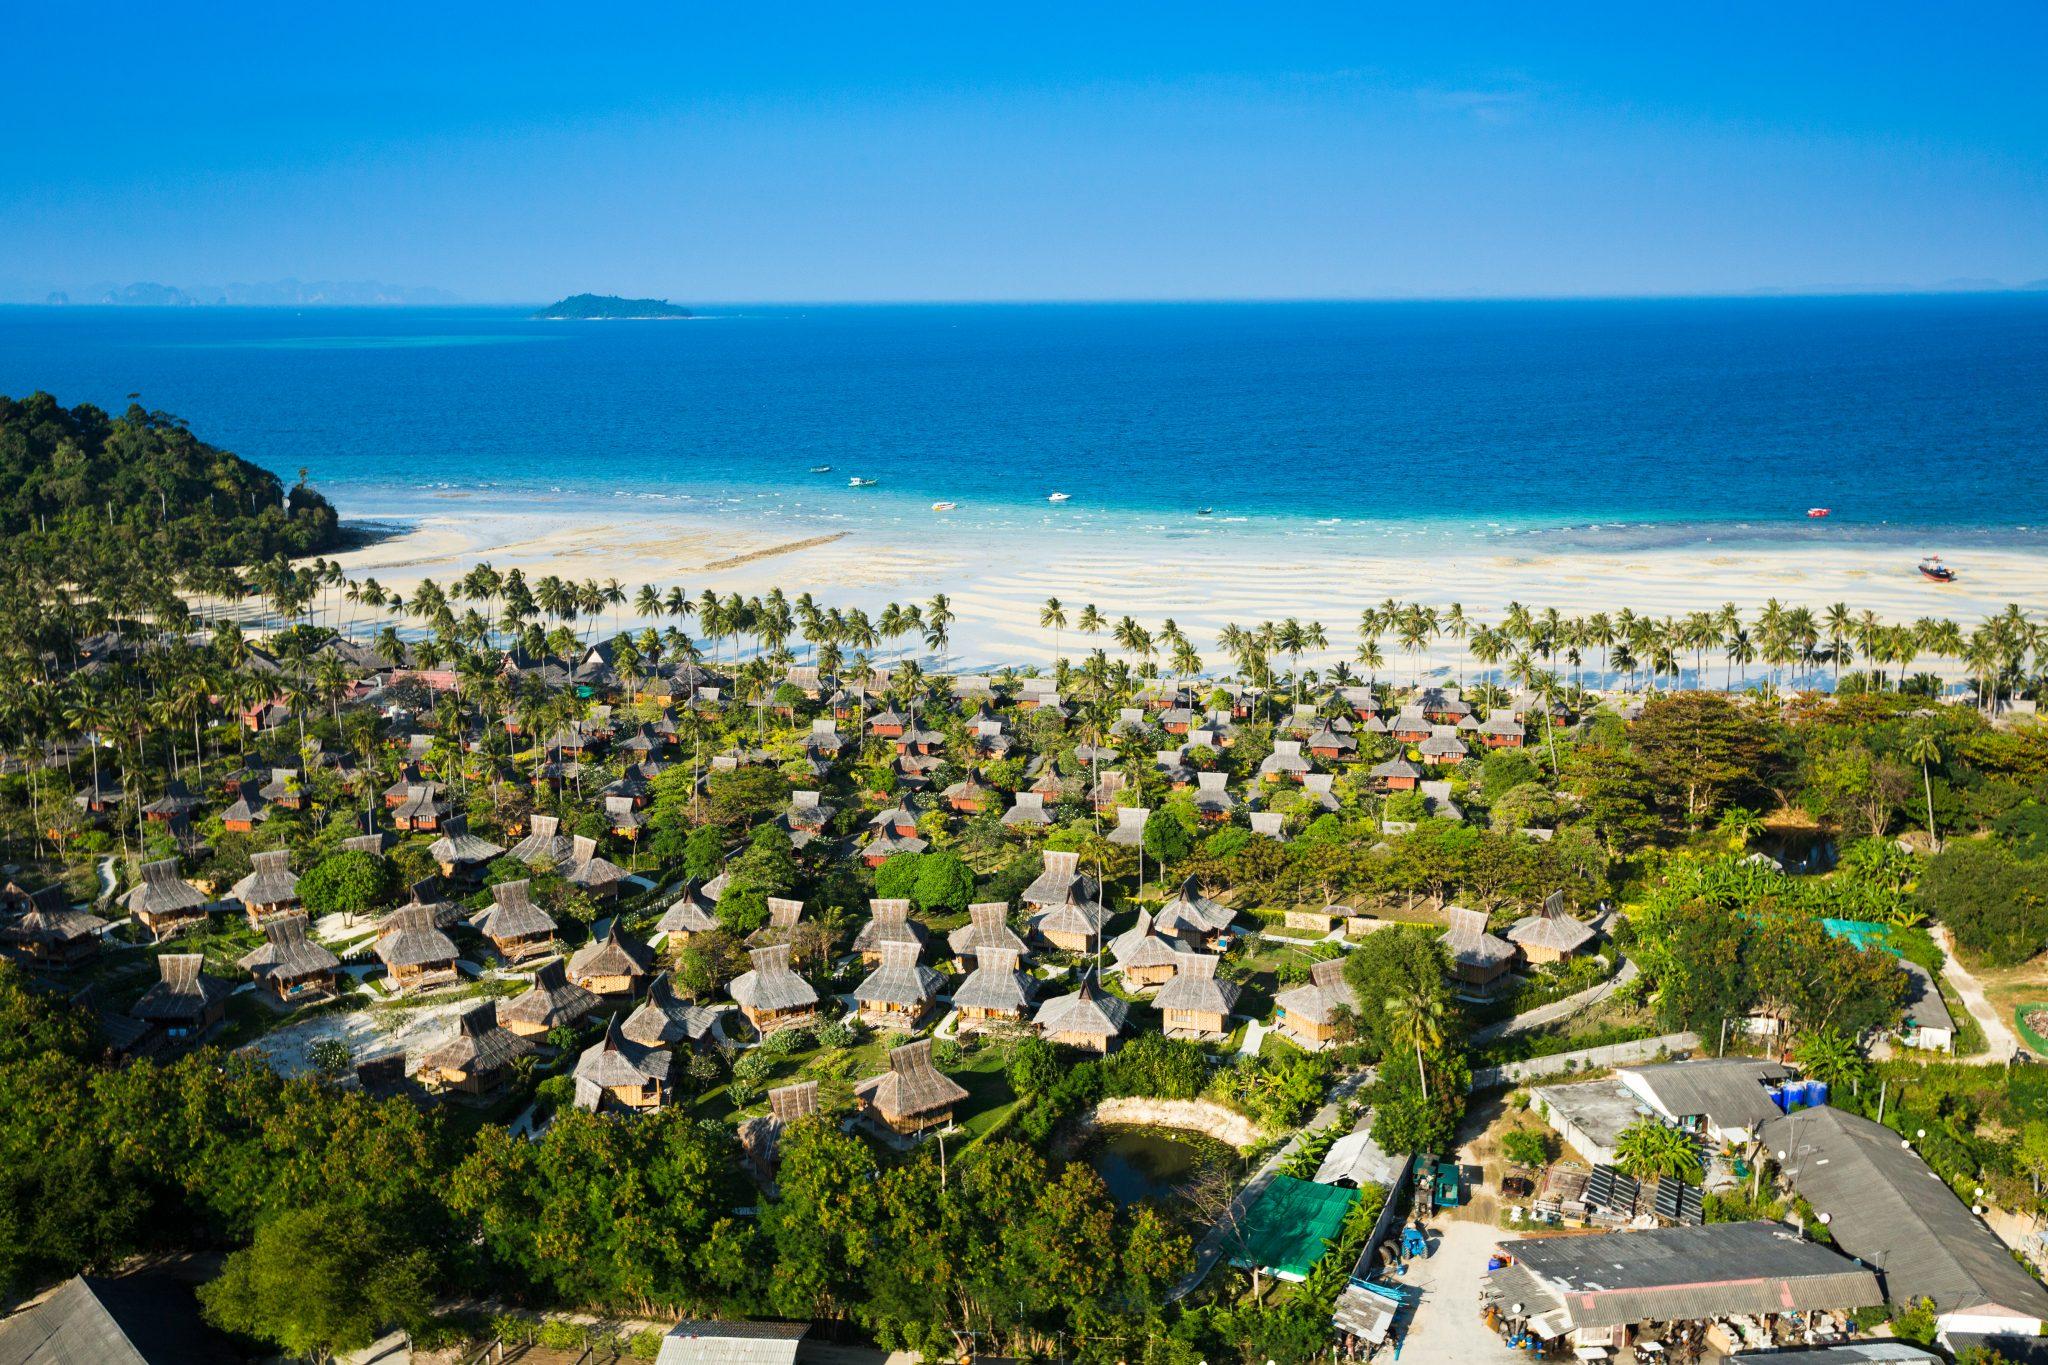 Thailand-Phuket-Town